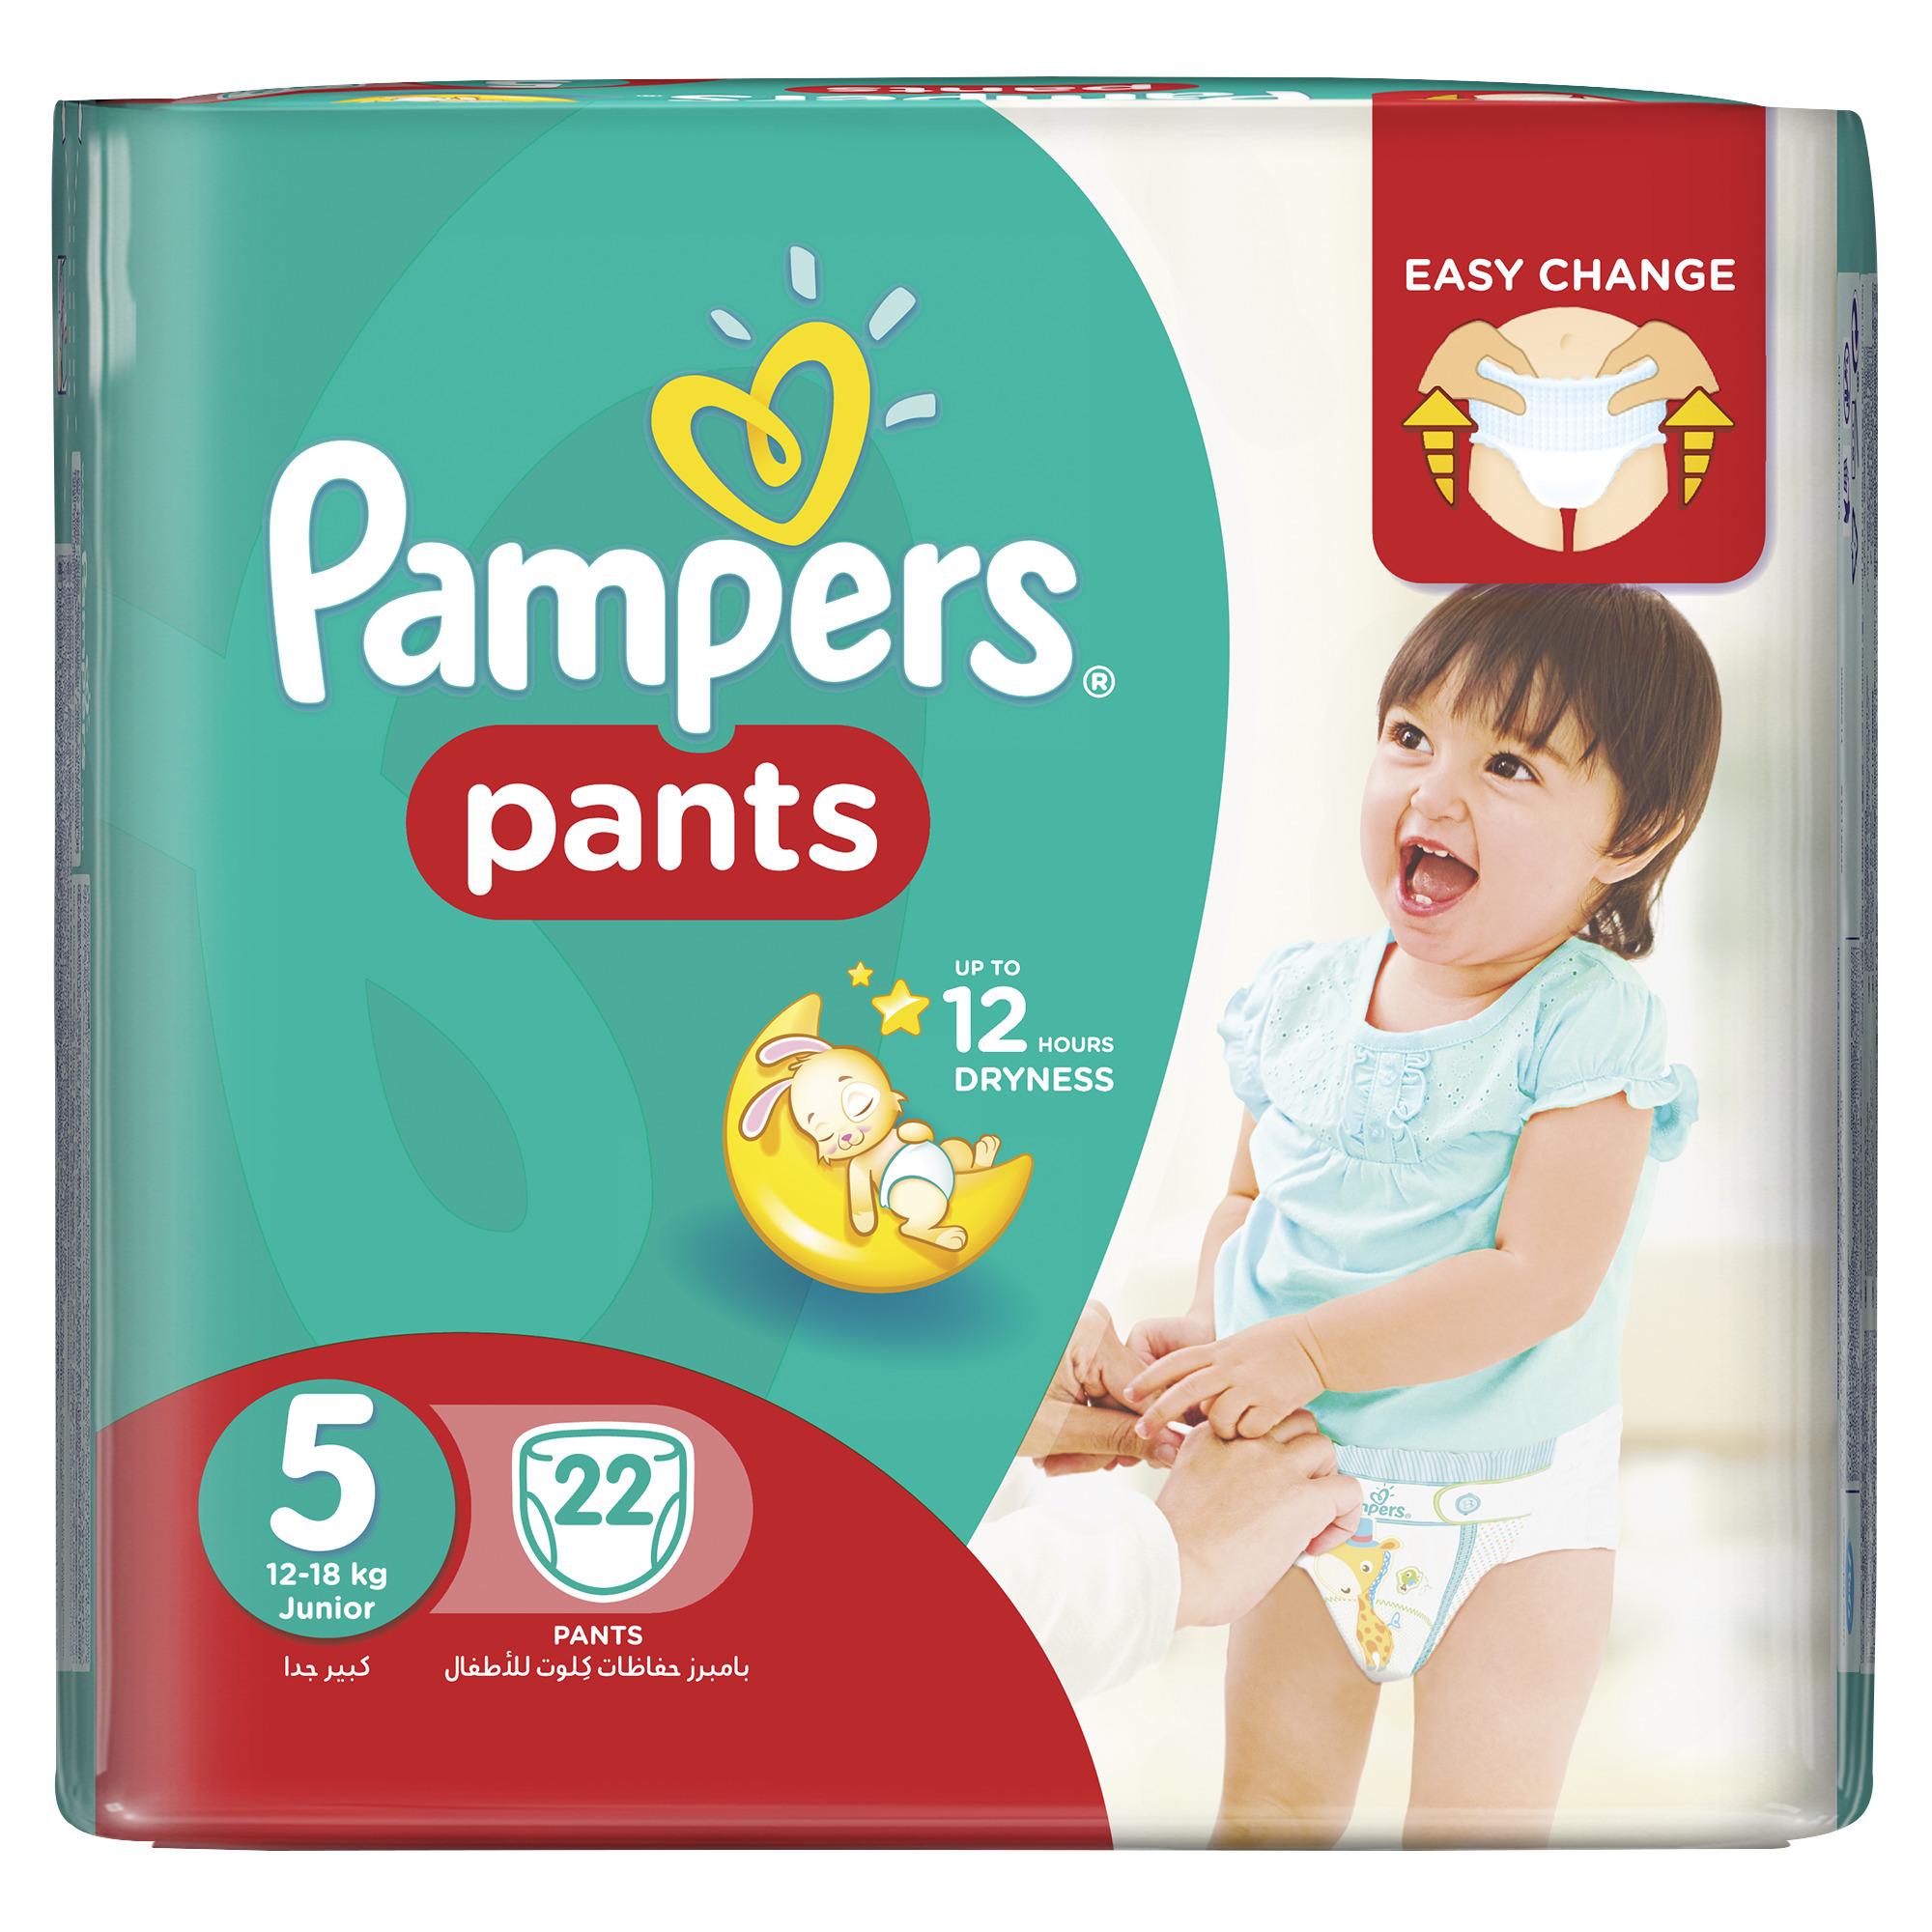 Sauskelnės PAMPERS Pants CP, 5 dydis 12-18 kg, 22 vnt